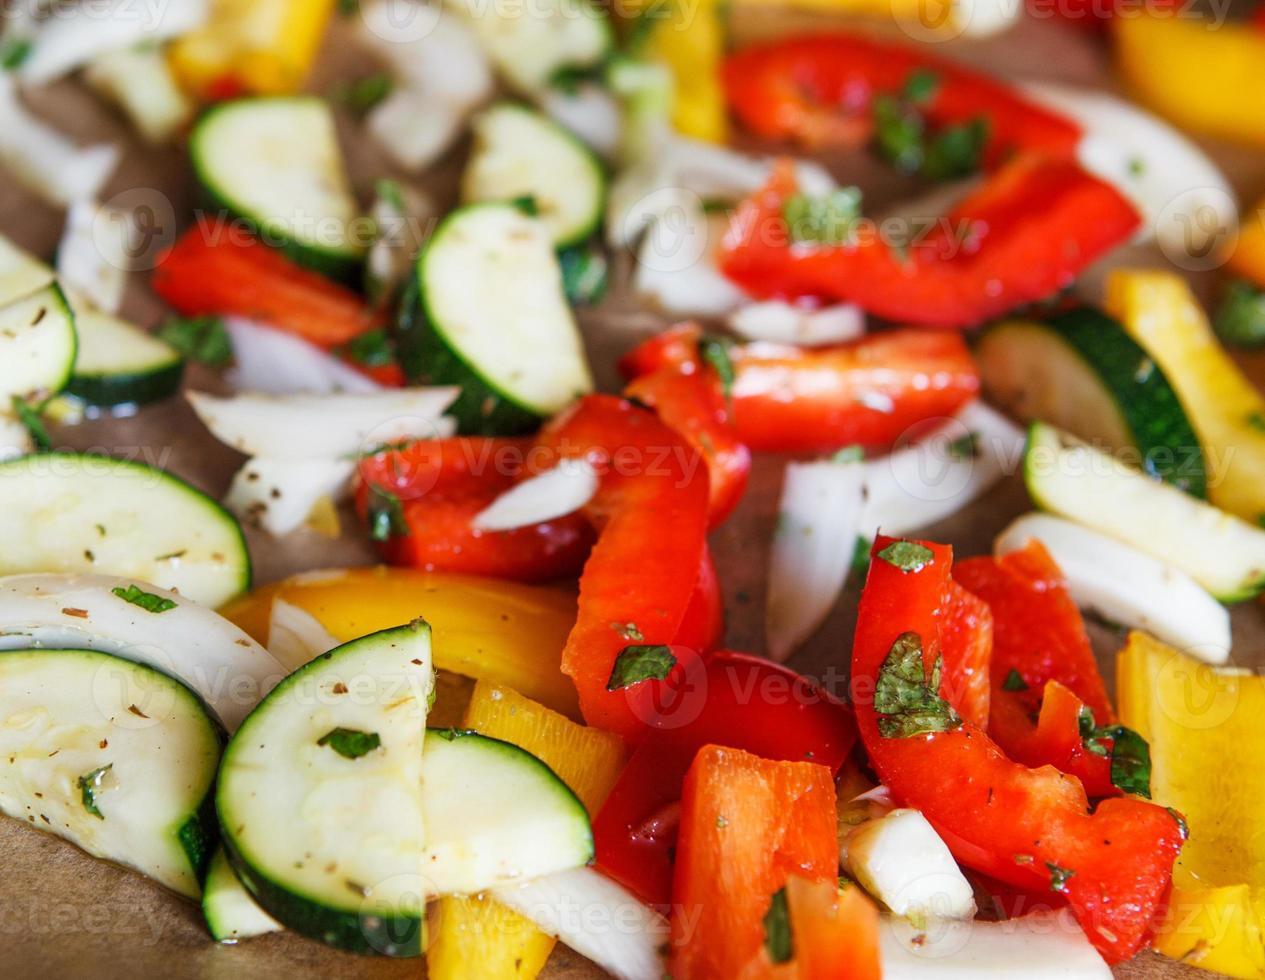 bunter Paprika-Zwiebel-Zucchini-Fenchel auf Backblech foto